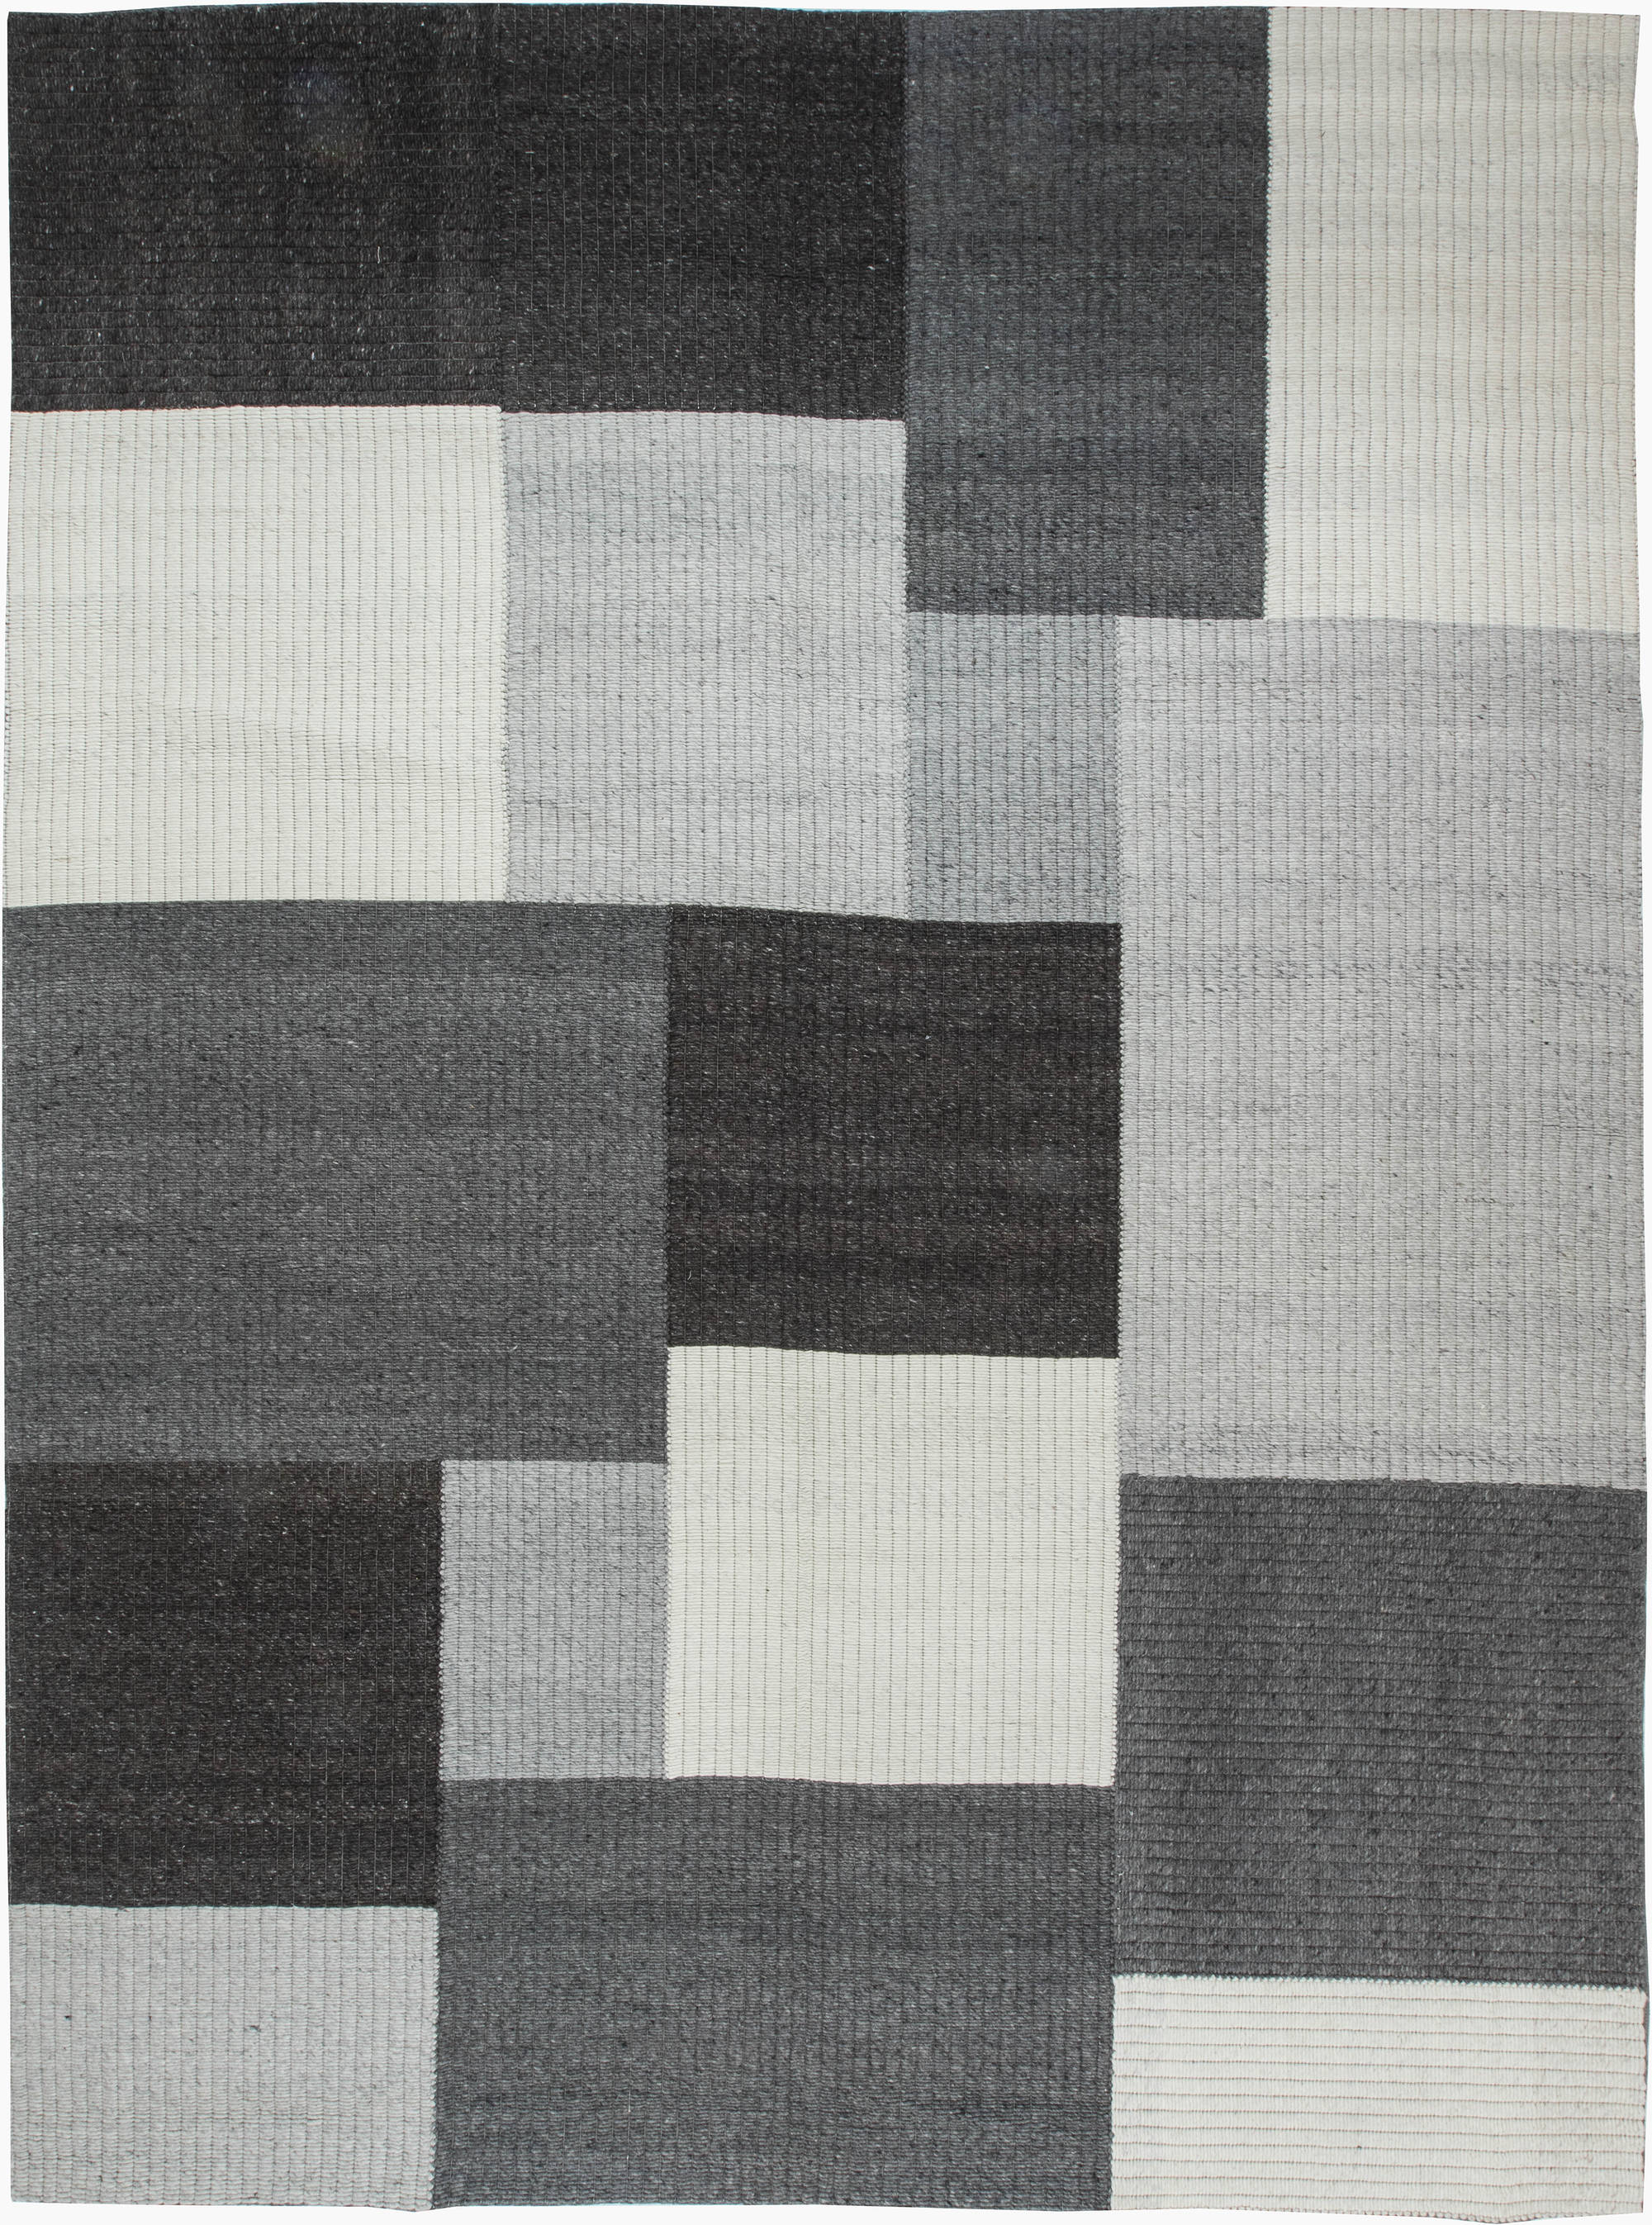 modern rug modern flat weave carpet n11587. arrow down  47161db02bae4ef92bdede423862e8f0c2b91f81311572b5a8bb90eef3001a34 GKIPTJM